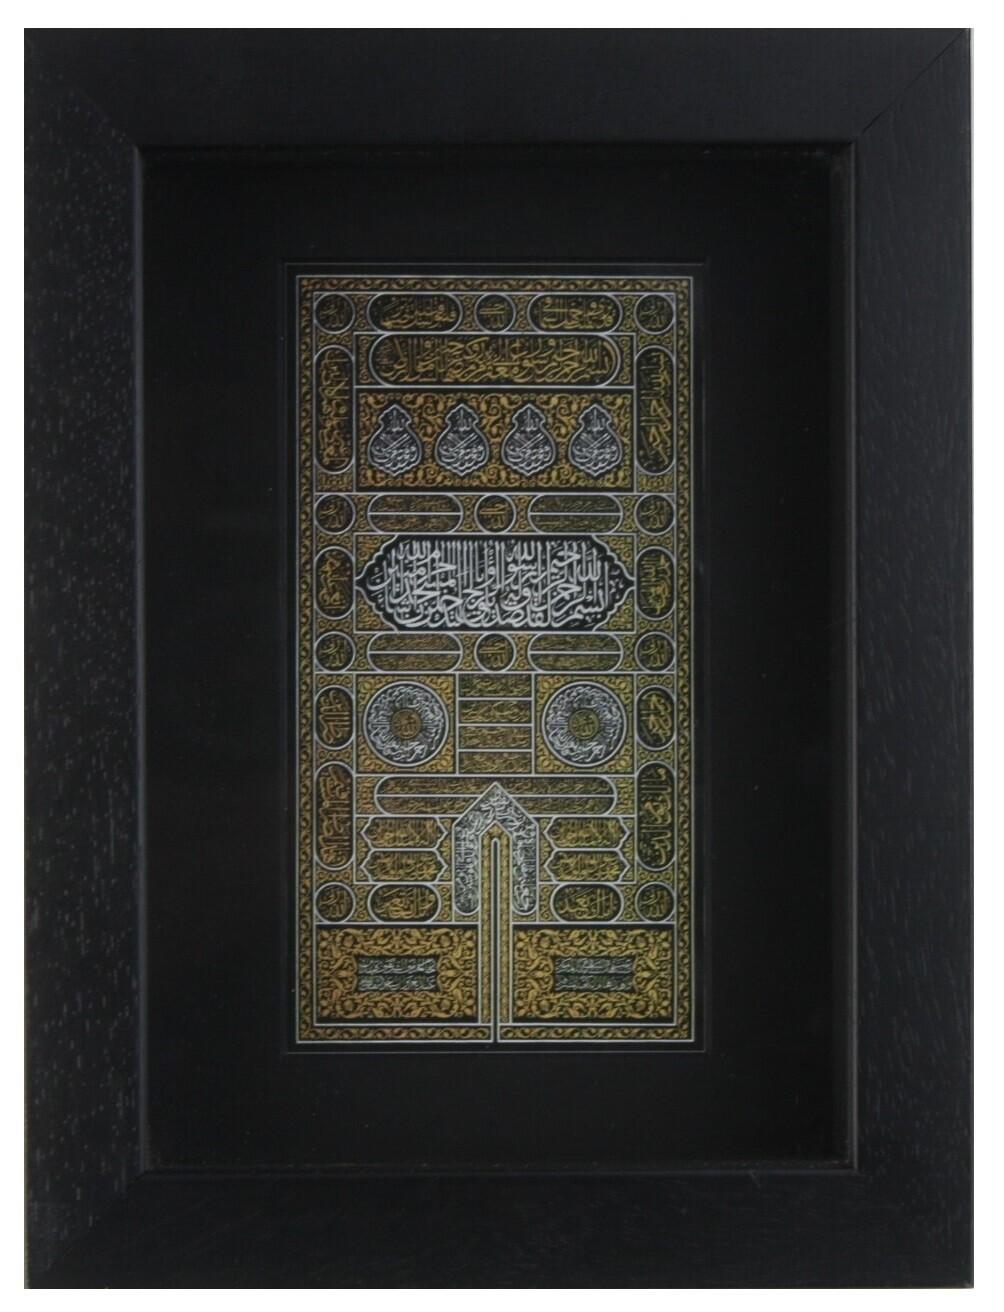 Majestic Kaaba Door in Black Memory Box Frame